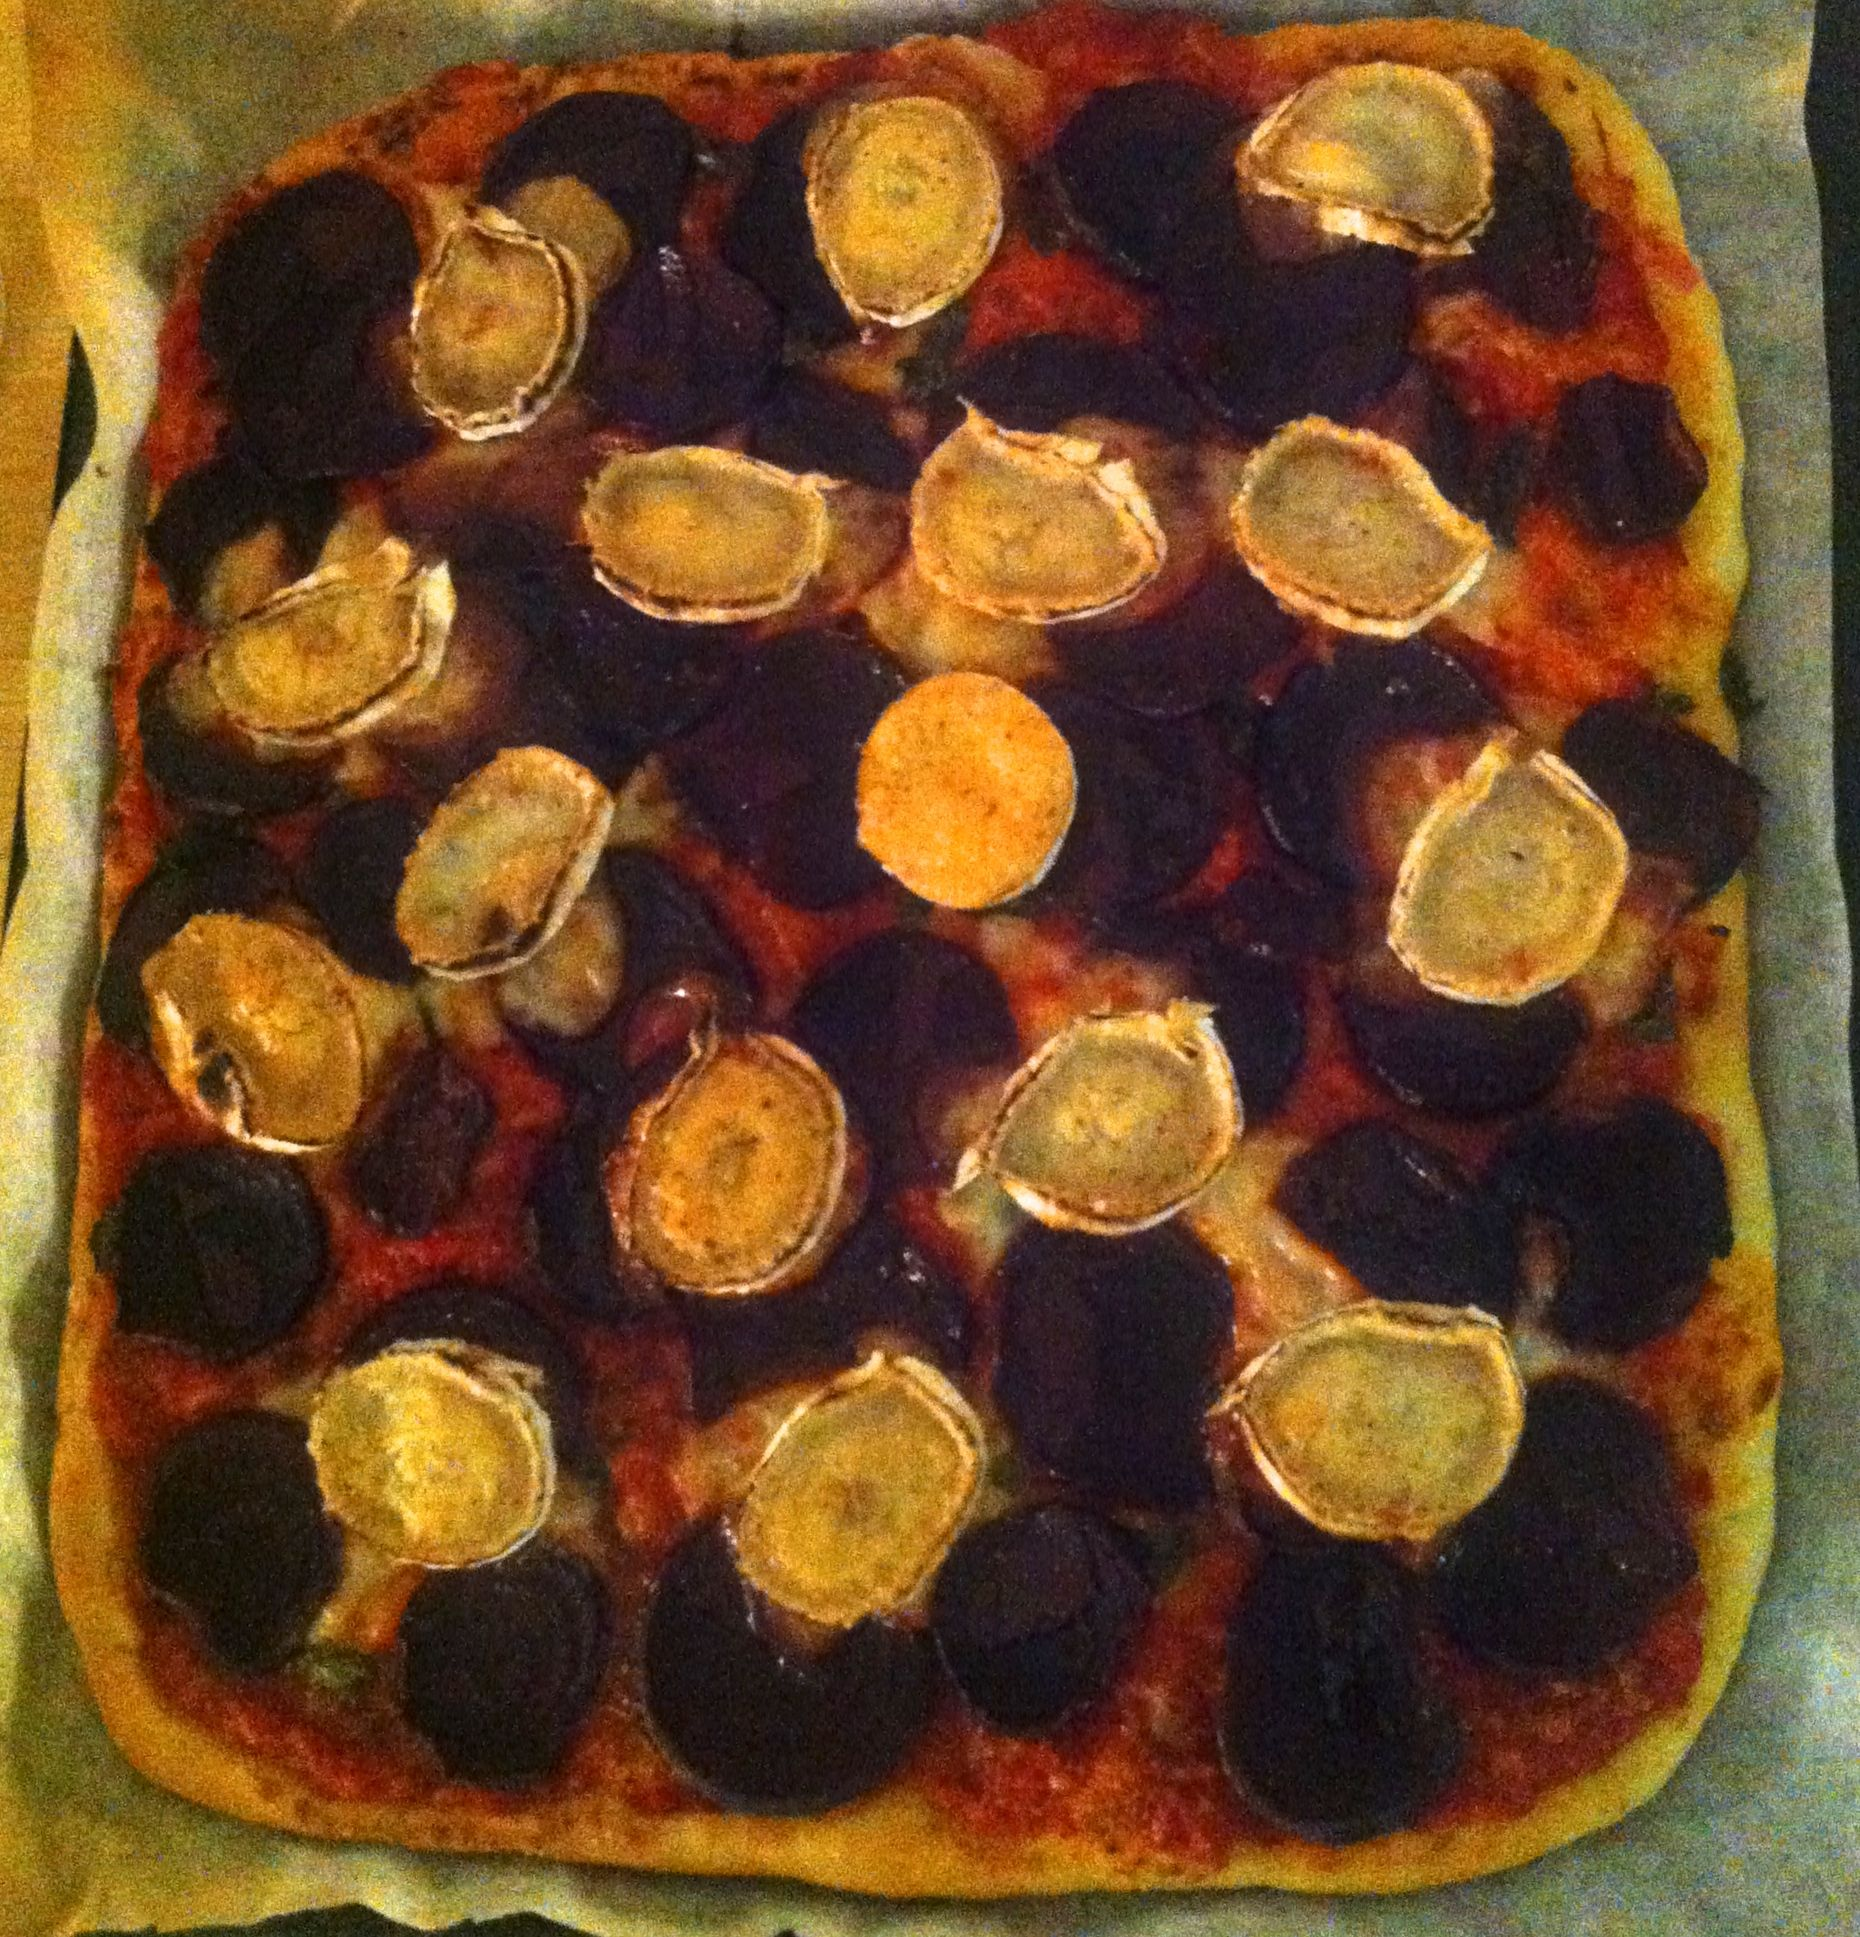 pizza_2_-_mennaan_vaan.jpg